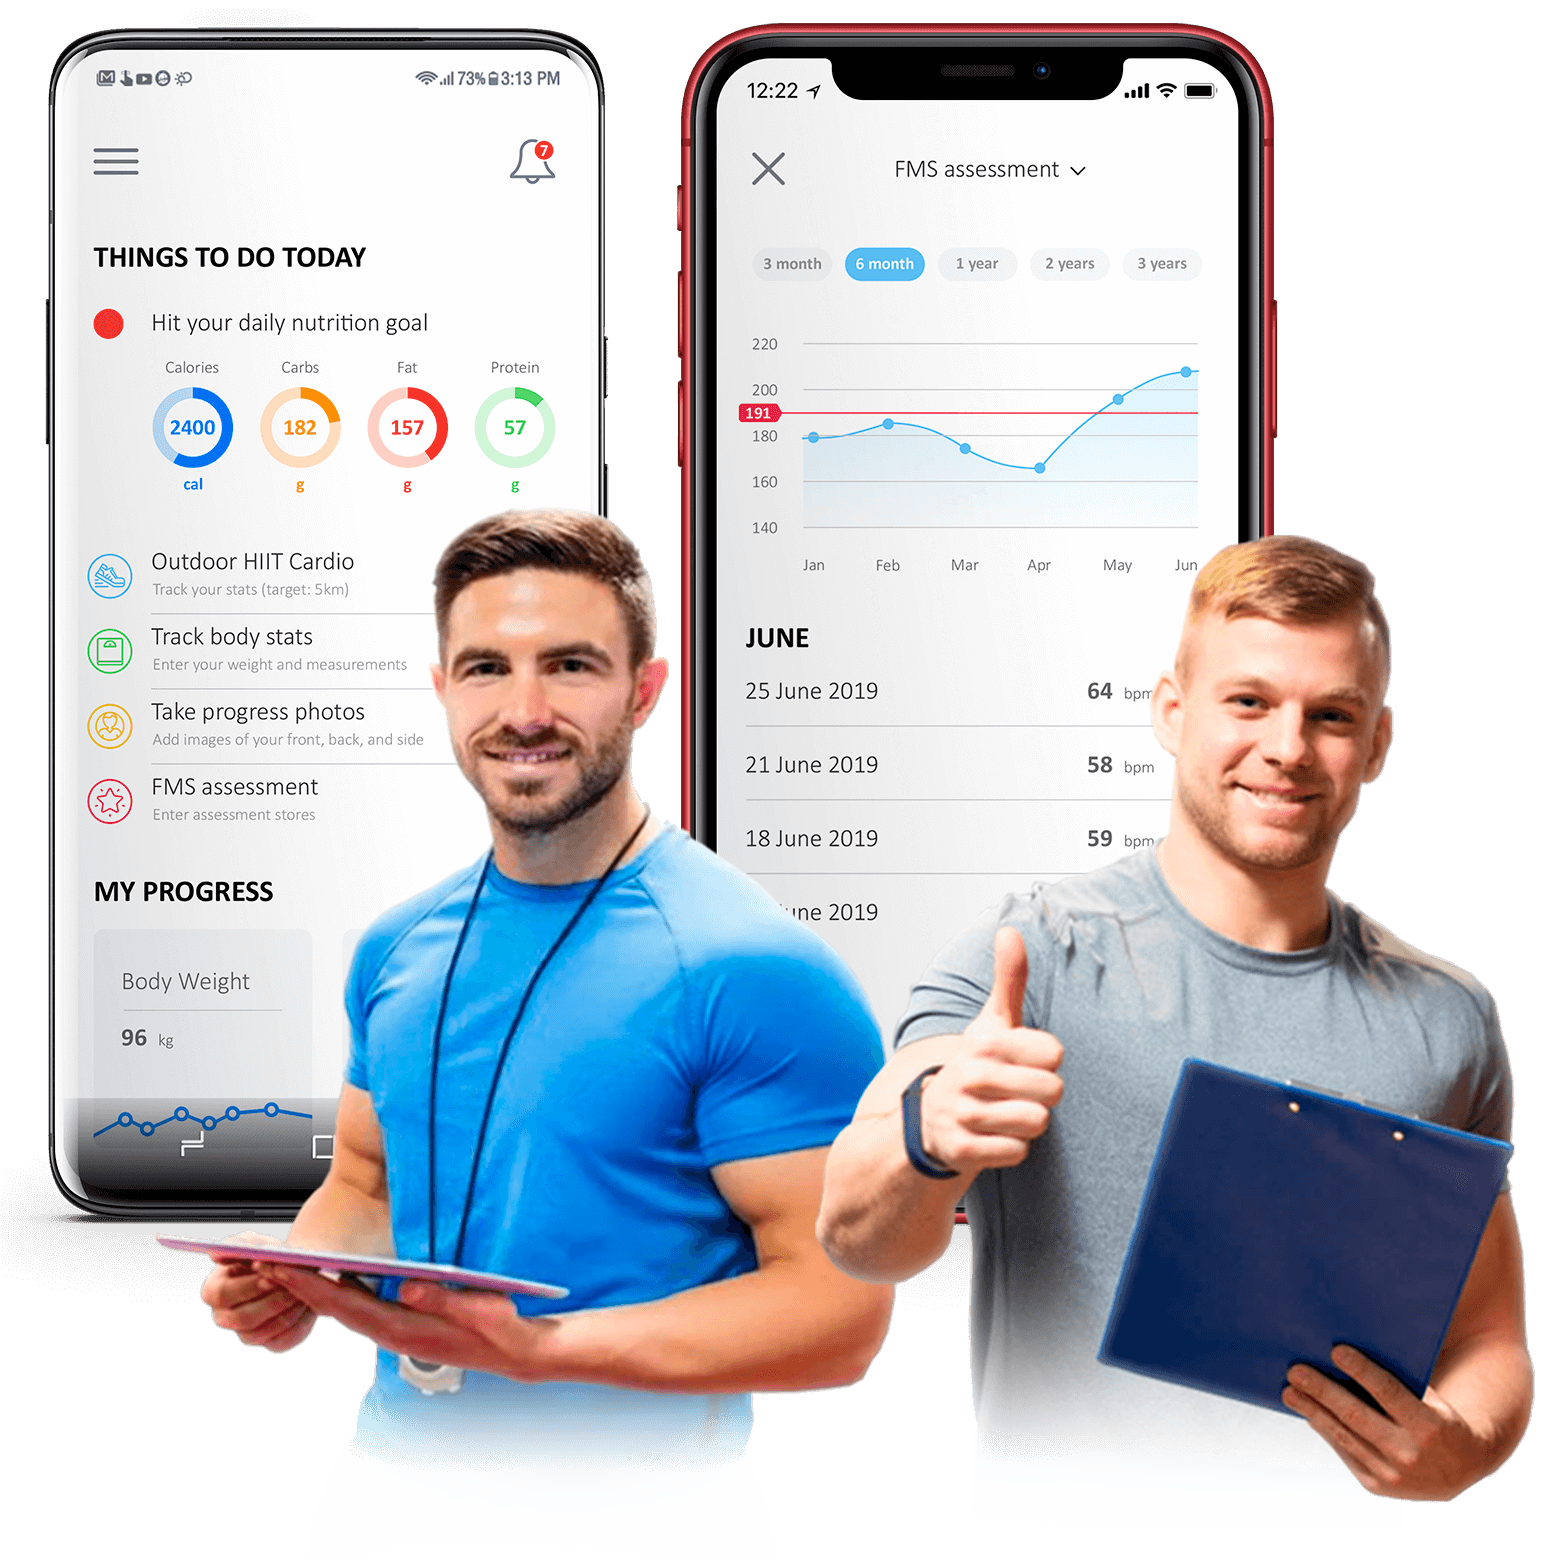 Cross-platform mobile app development for fitness trainers